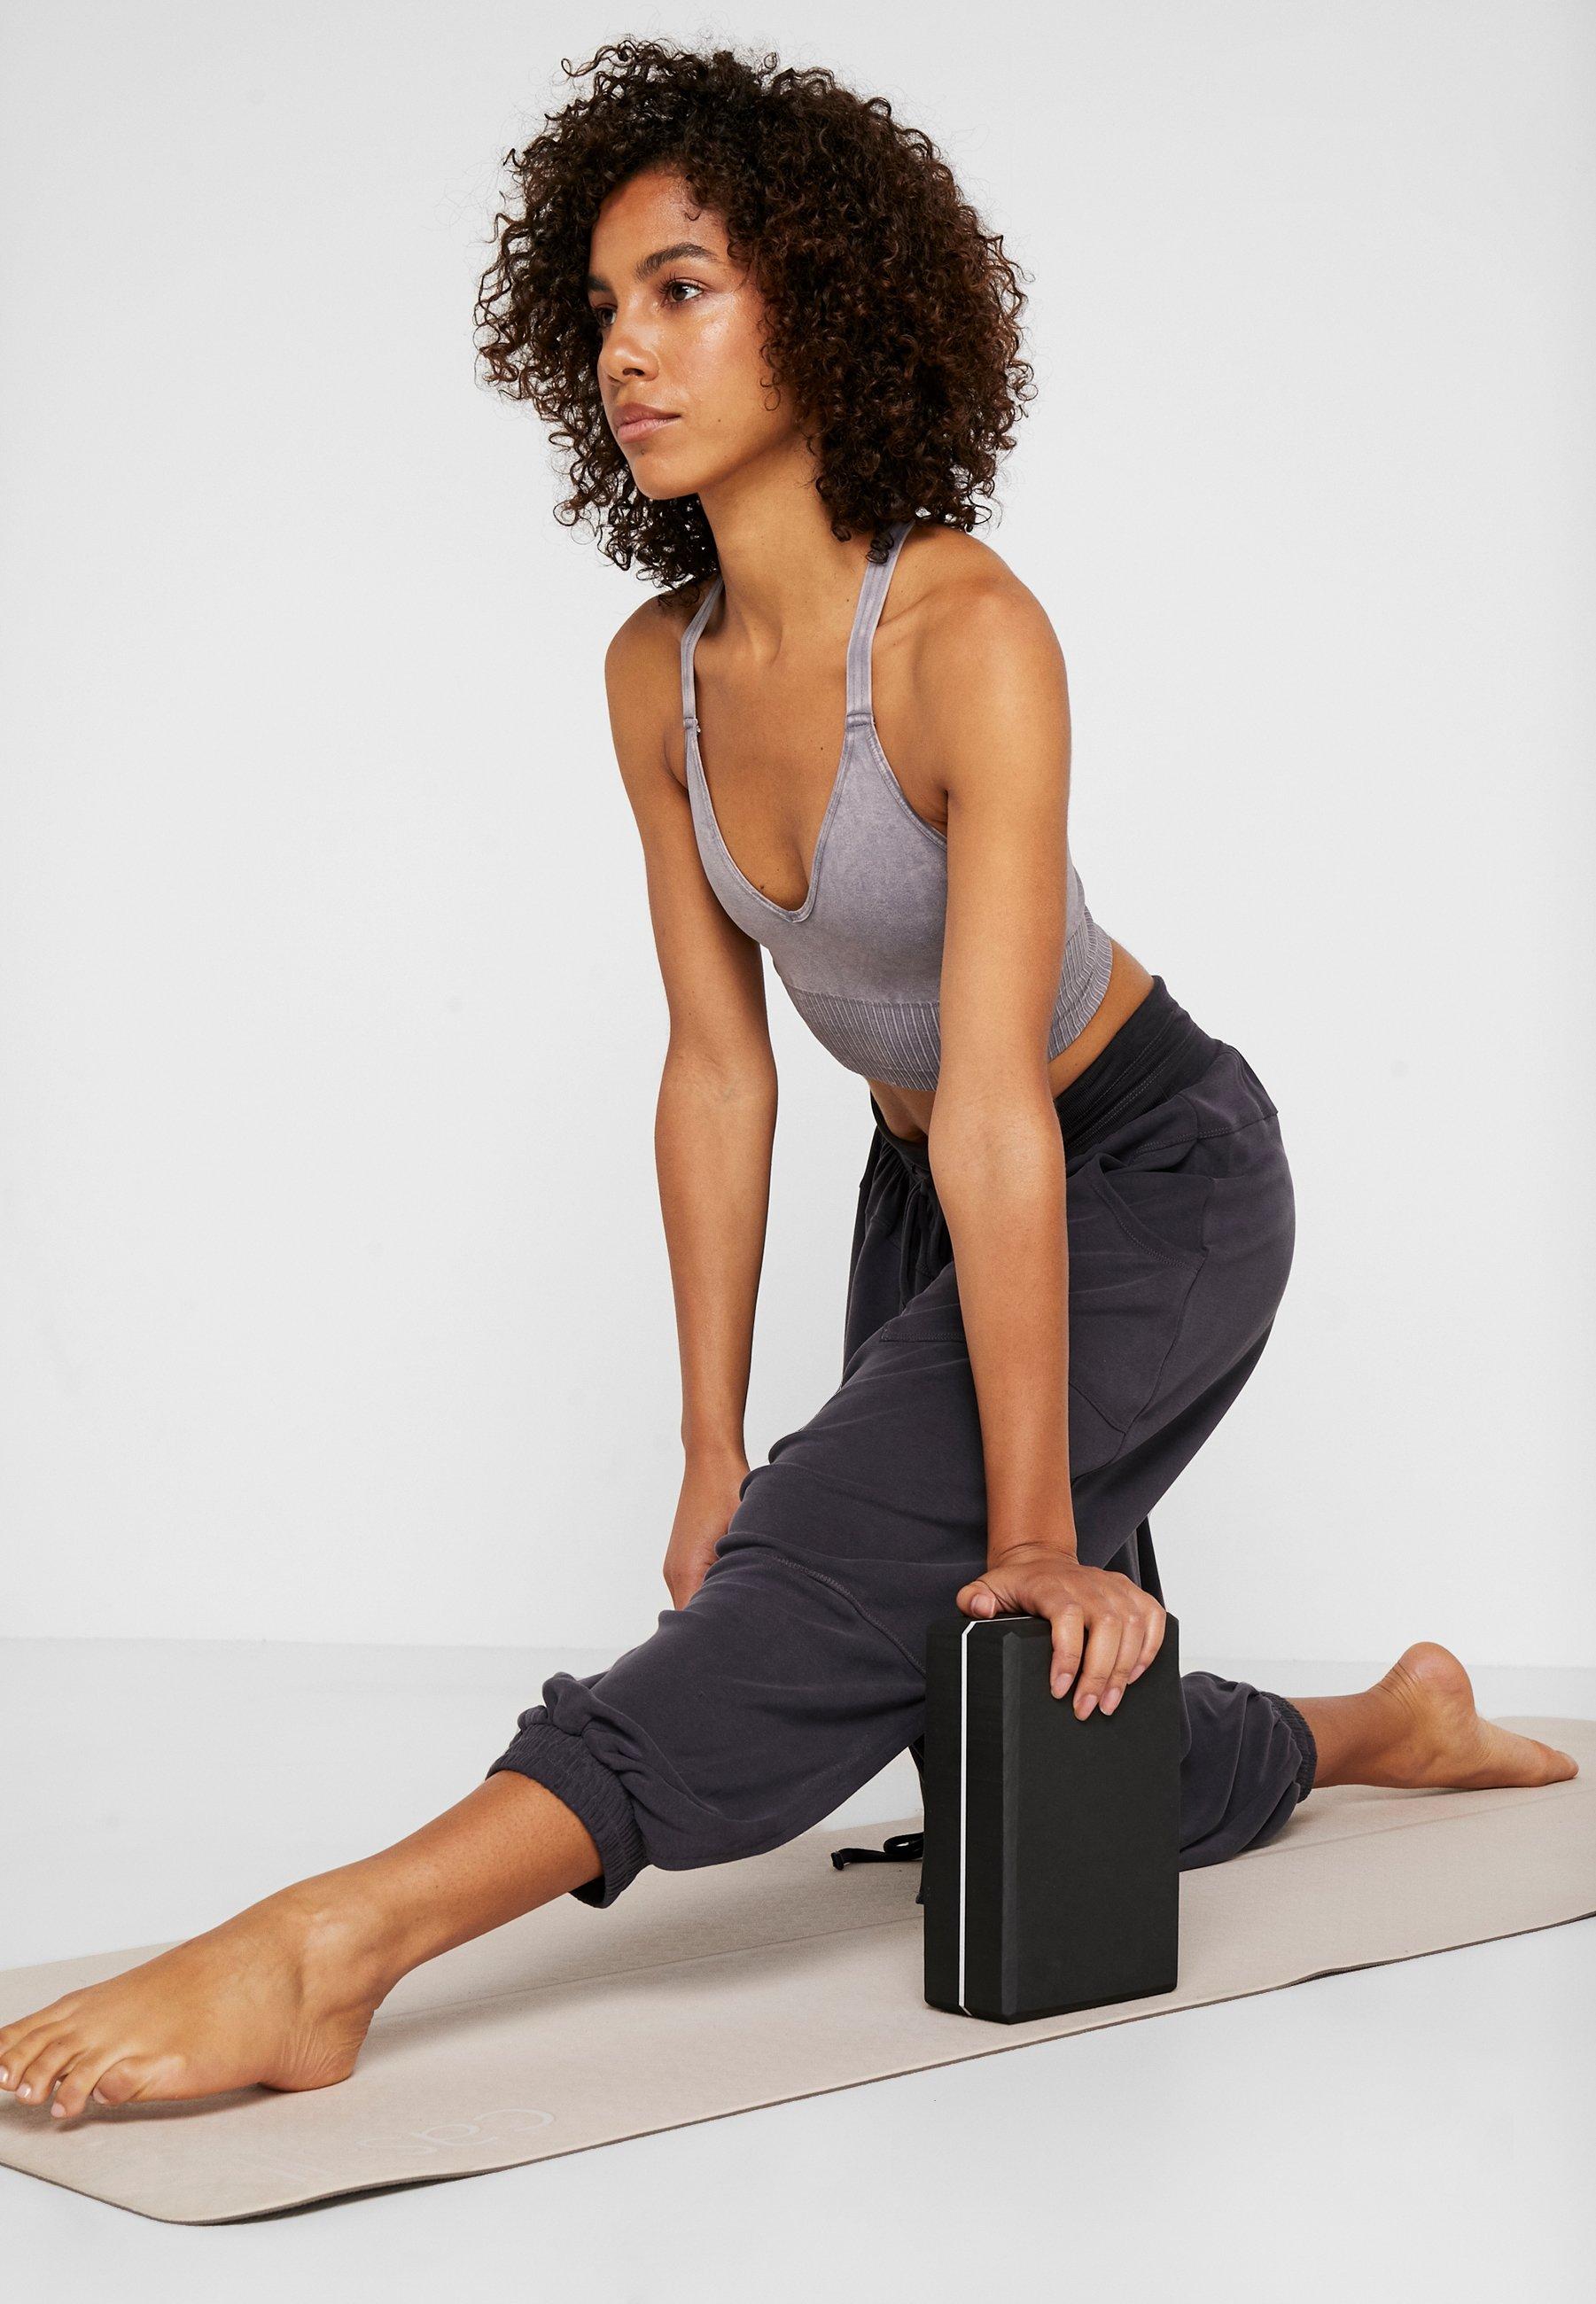 Women YOGA BLOCK - Fitness / Yoga